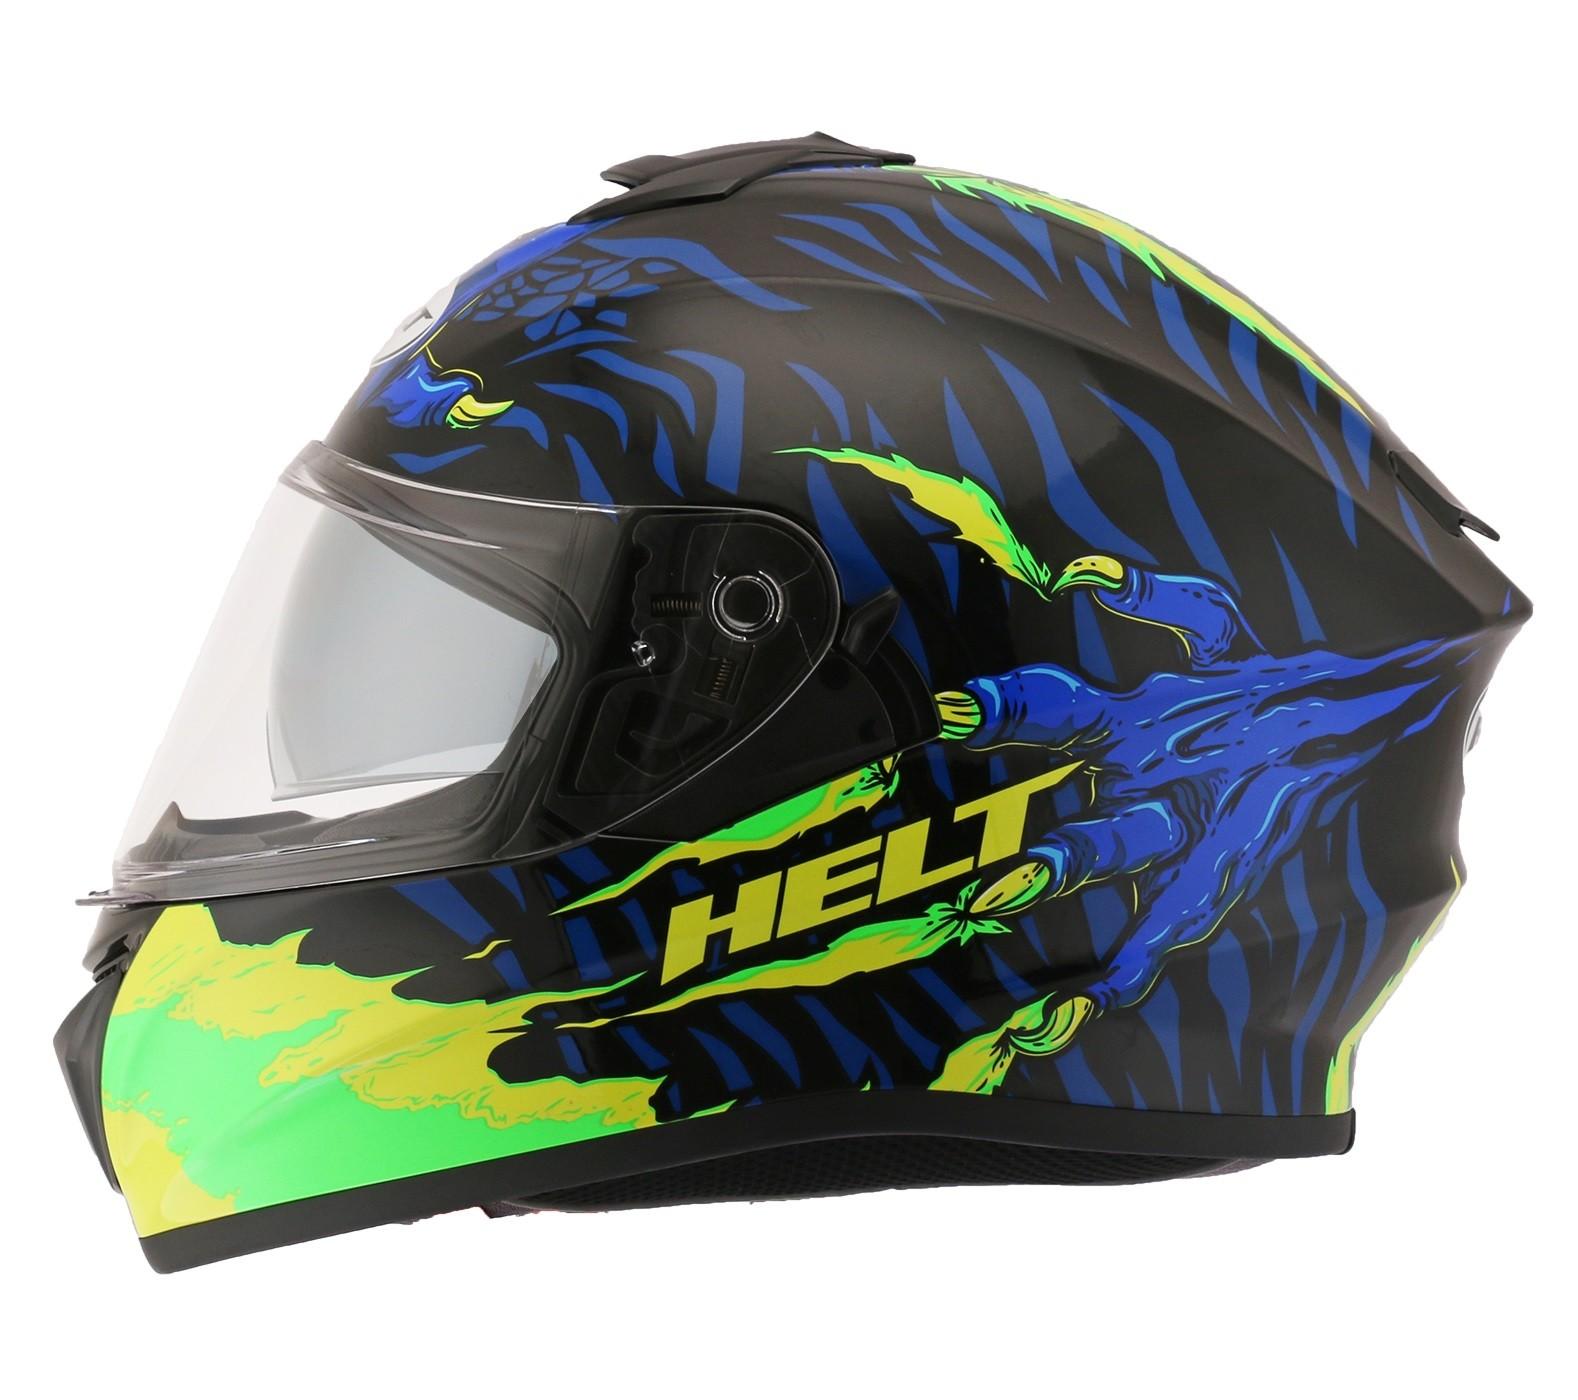 Capacete Helt 981 Avant Glass Monster Verde/Azul C/ Óculos Interno Fumê